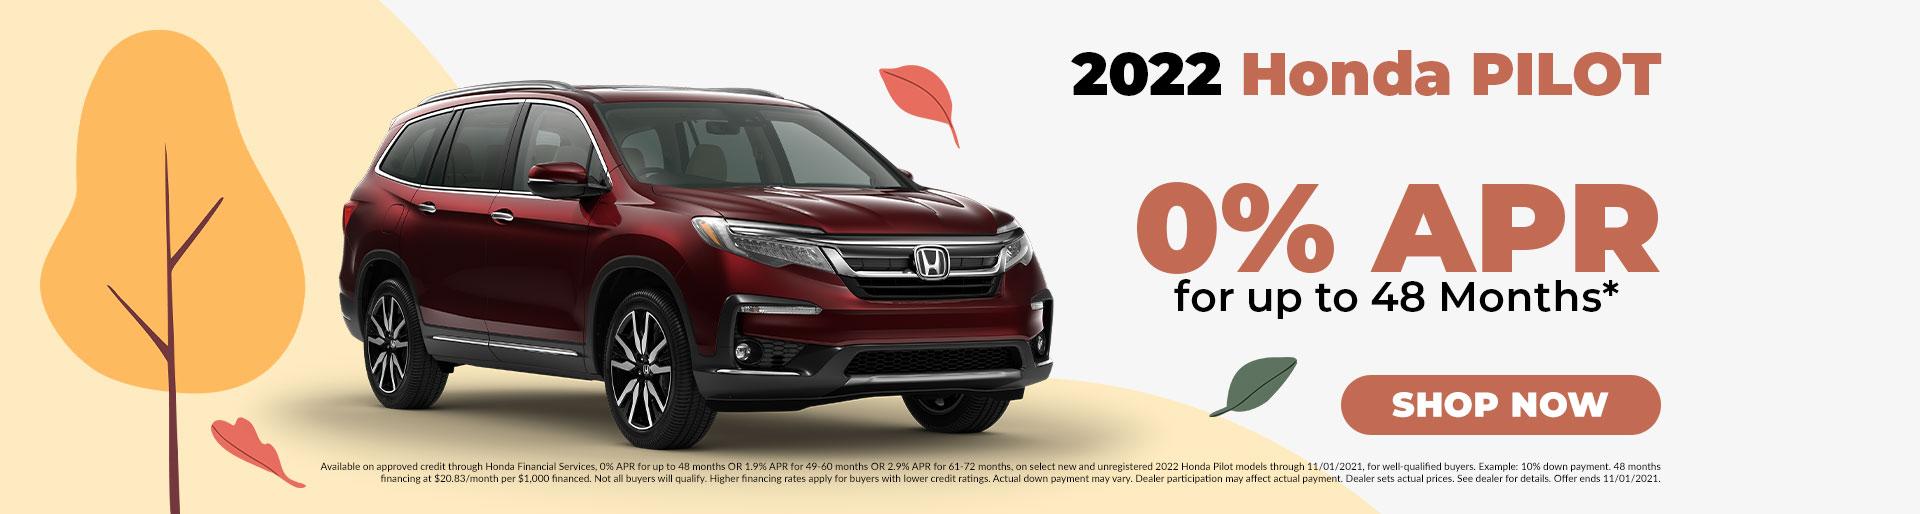 2022 Honda Pilot Offer in Jefferson City, MO